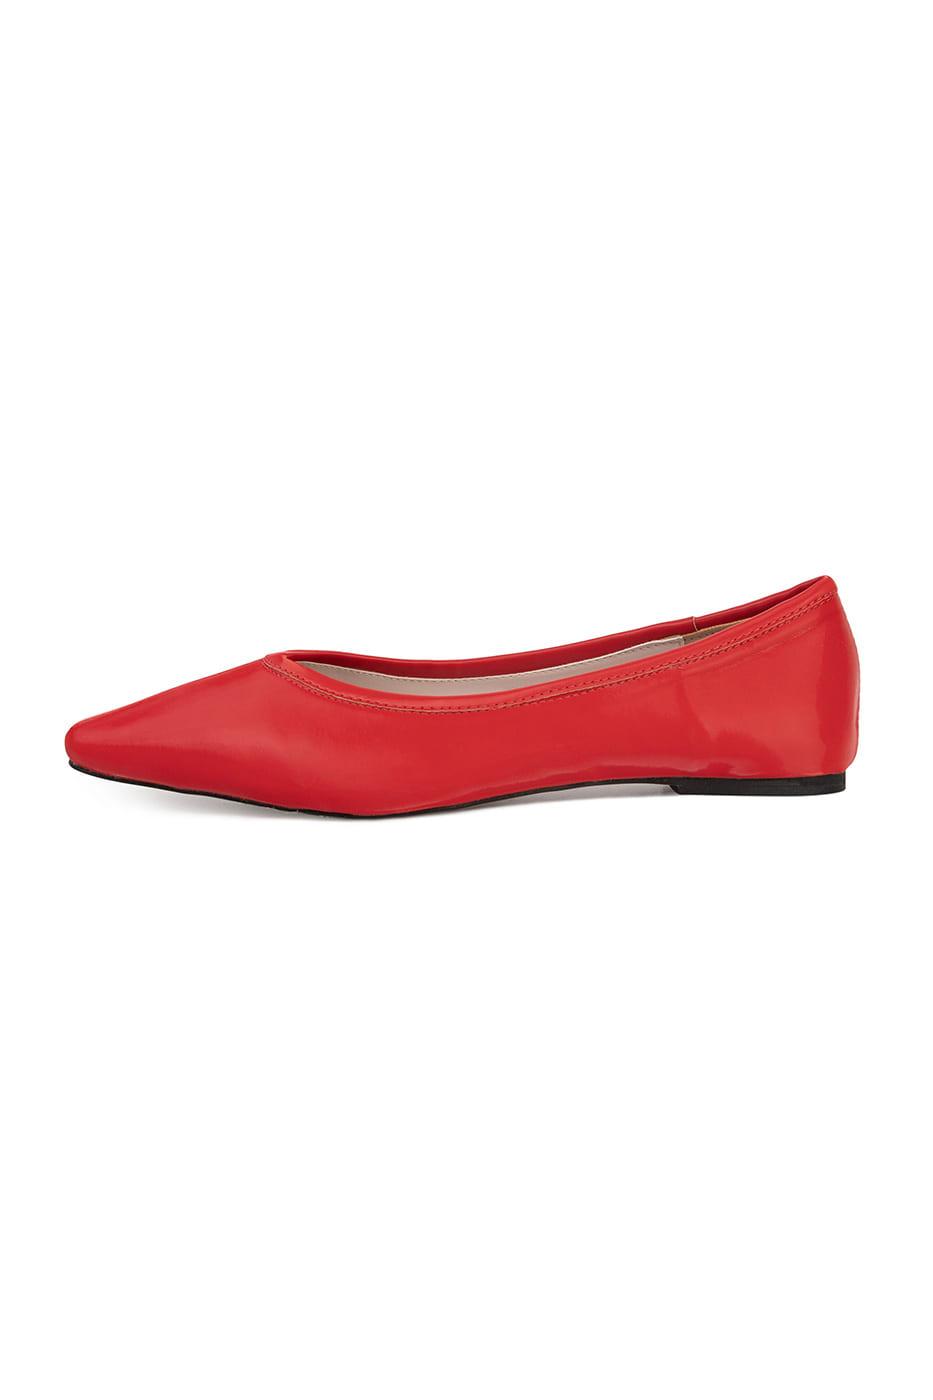 Les Shine Flat Shoes